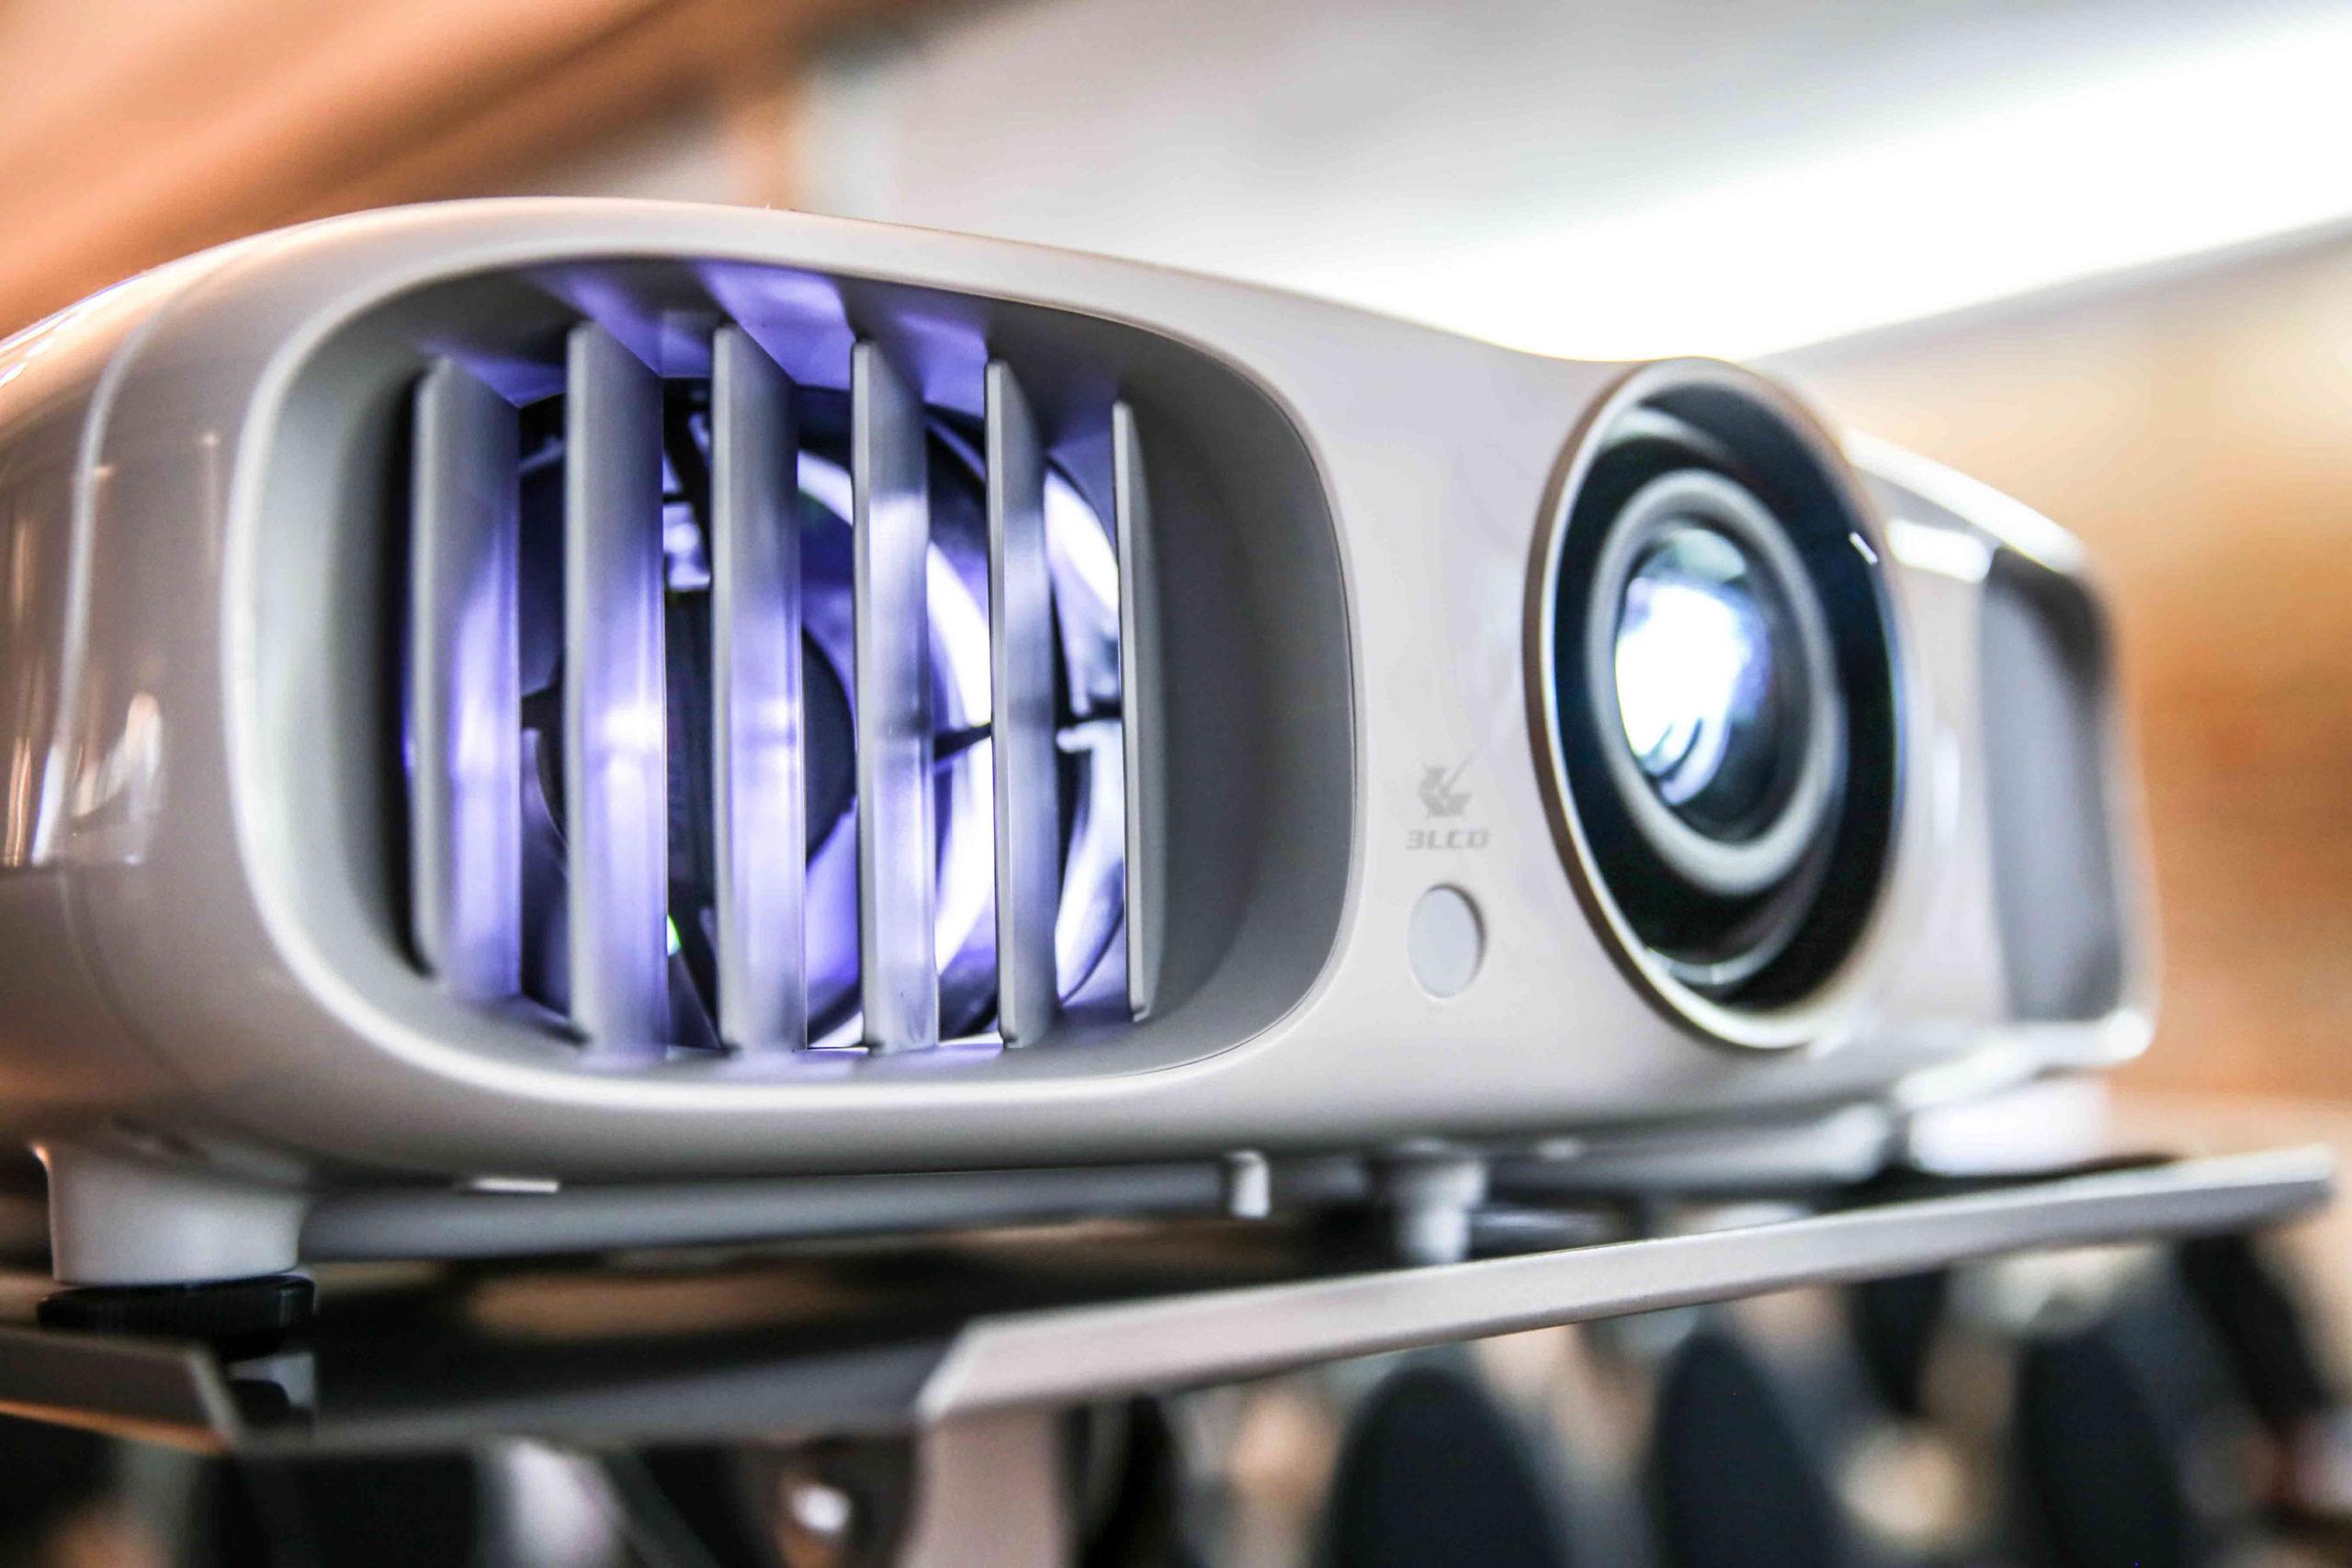 Beamer | Projektion | Projektoren | Leinwand | Mikrofon | Beschallung | Tontechnik | LCD | Display | Mieten | Buchen | Anfragen | Lehmann | Eventservice | Hannover